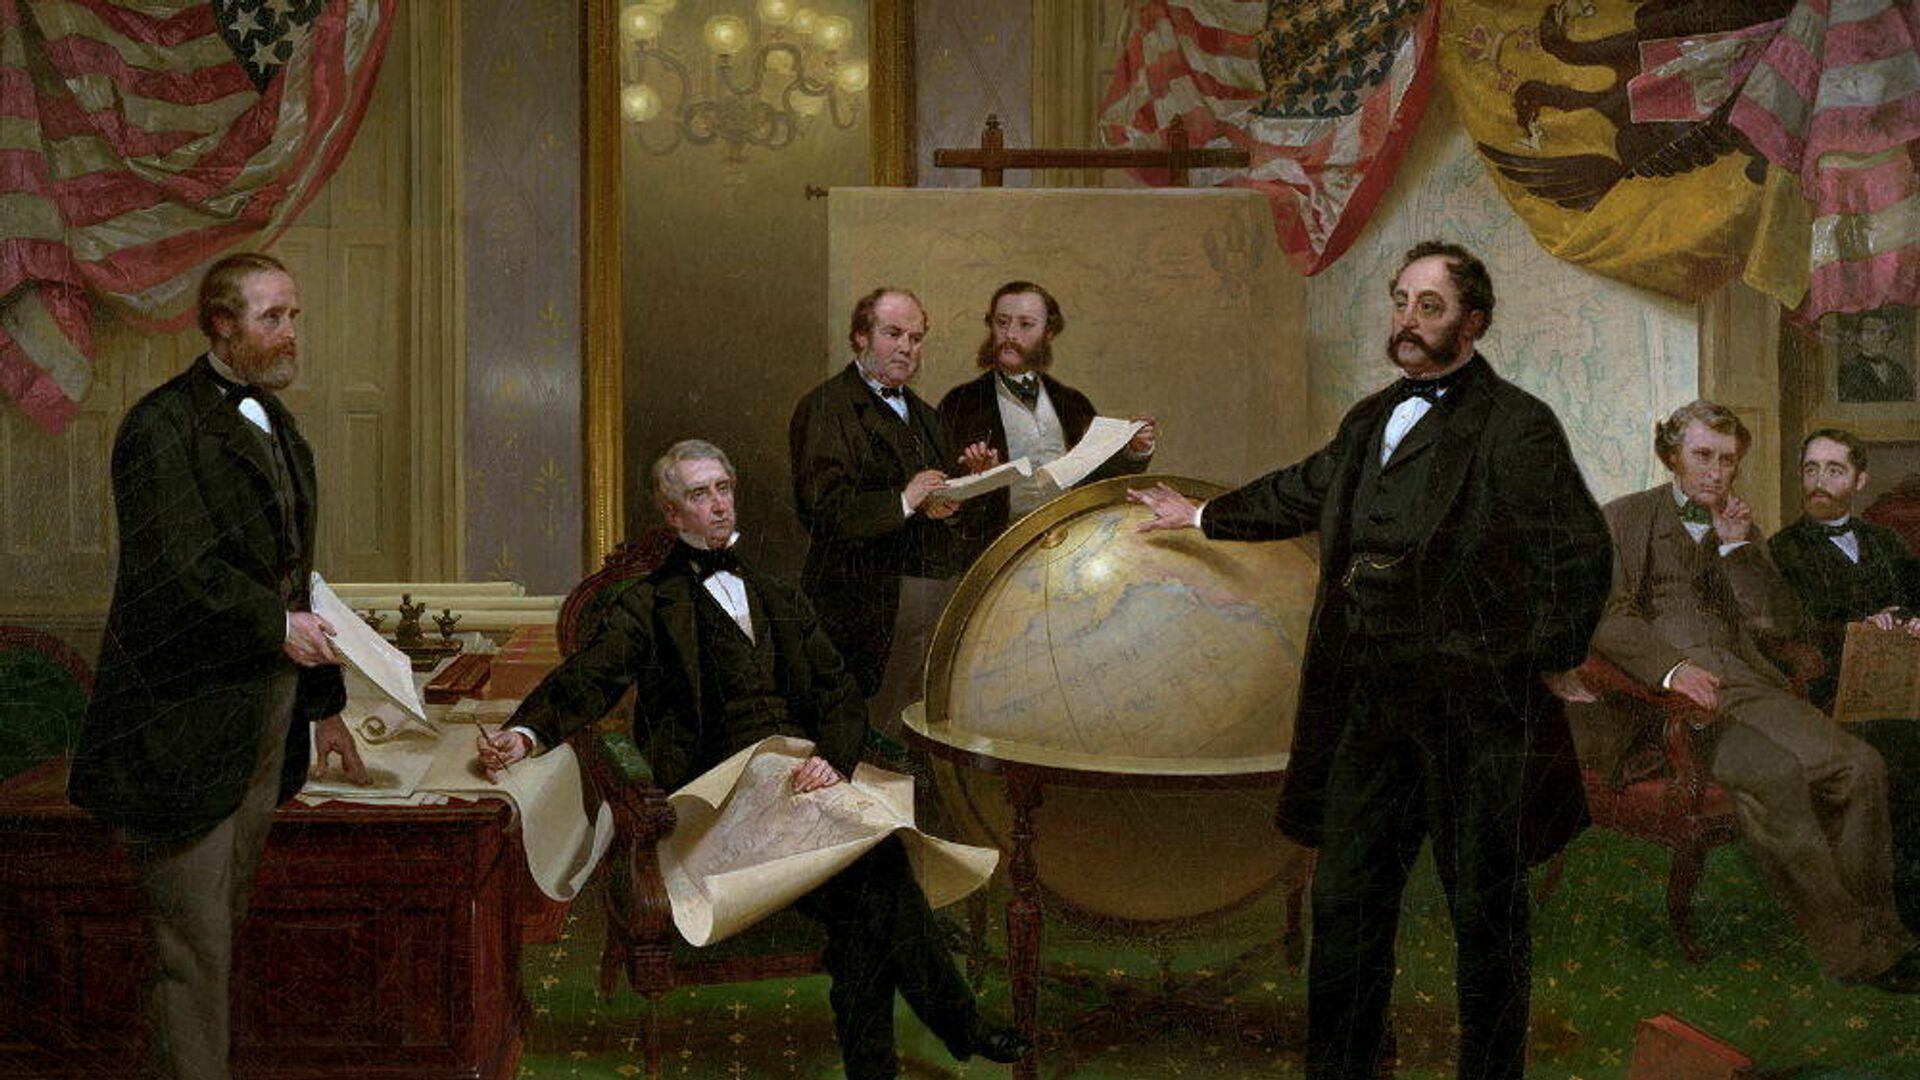 La firma del documento sobre la compra de Alaska - Sputnik Mundo, 1920, 30.03.2021